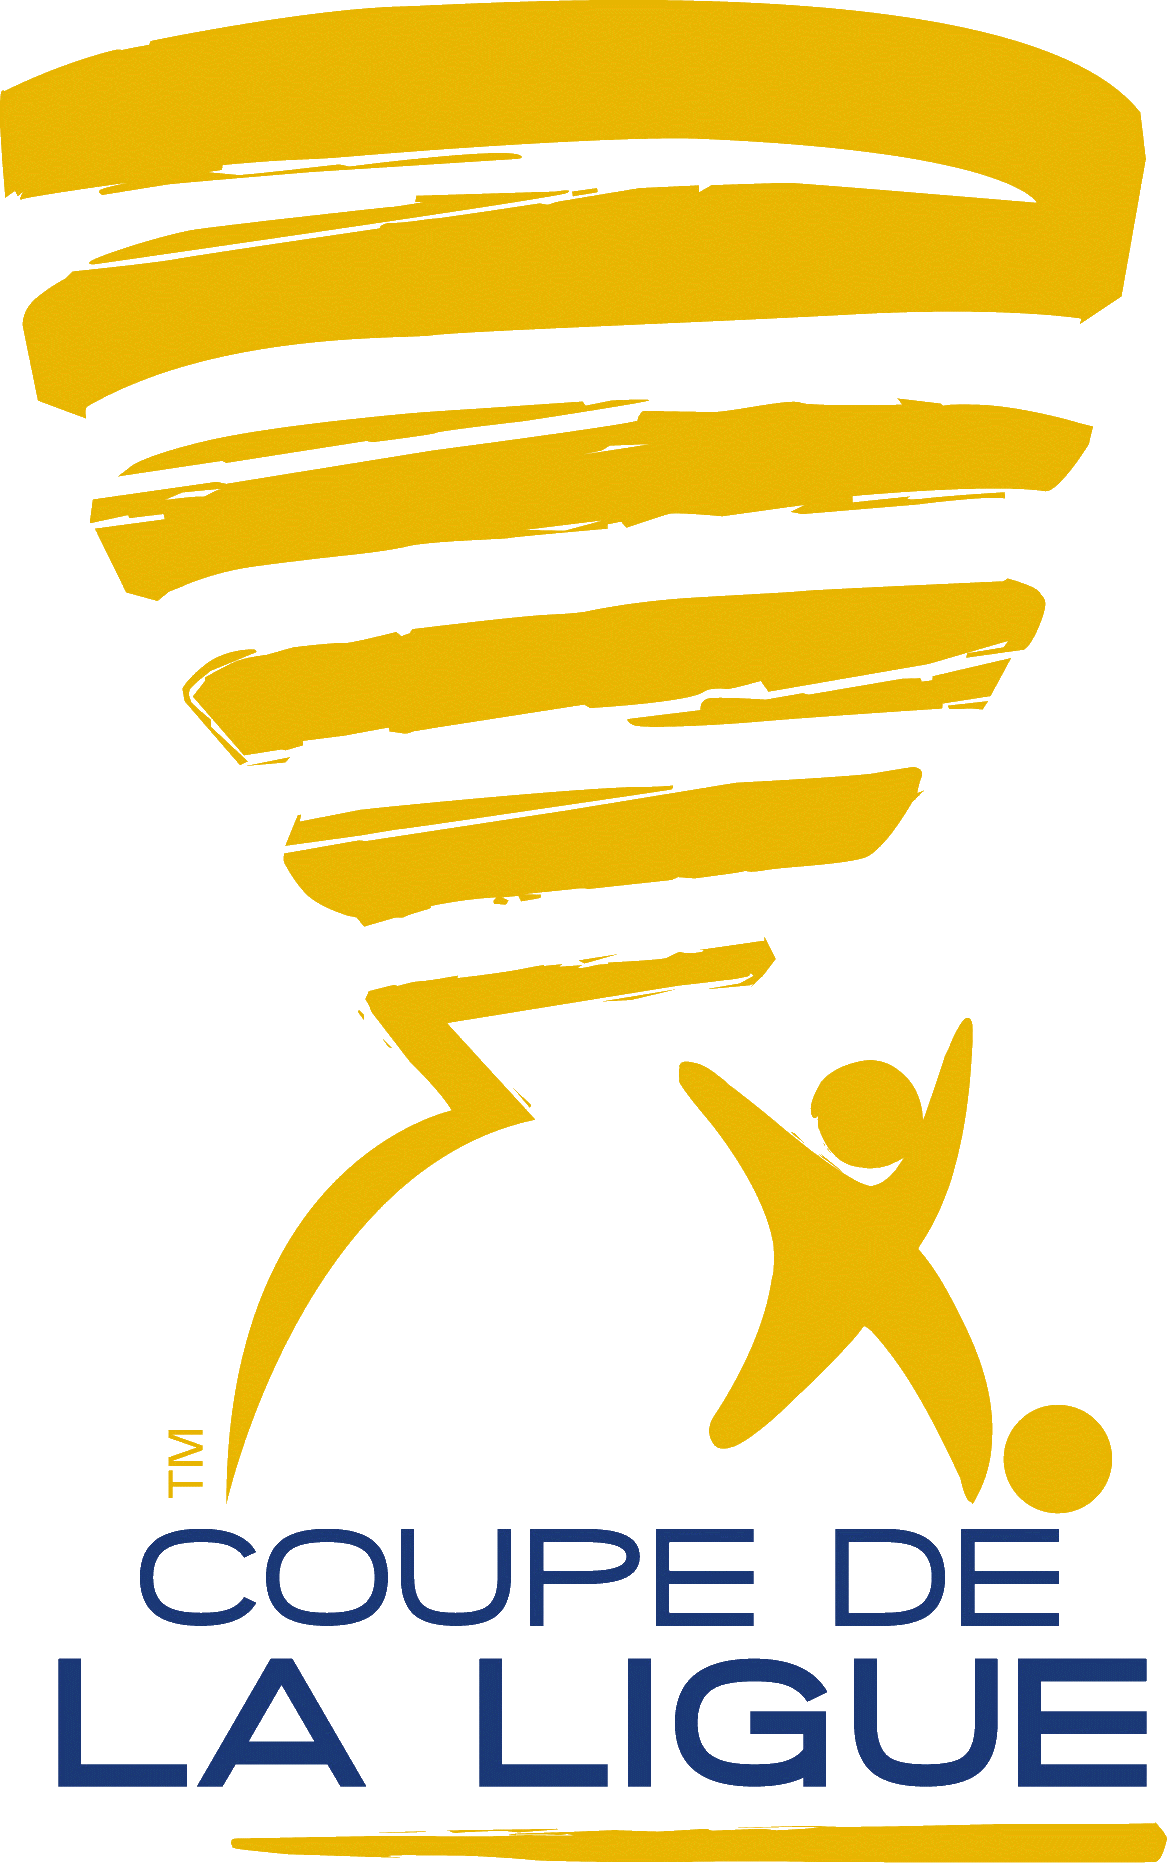 Piala liga perancis wikipedia bahasa indonesia - Coupe de la ligue france 3 ...